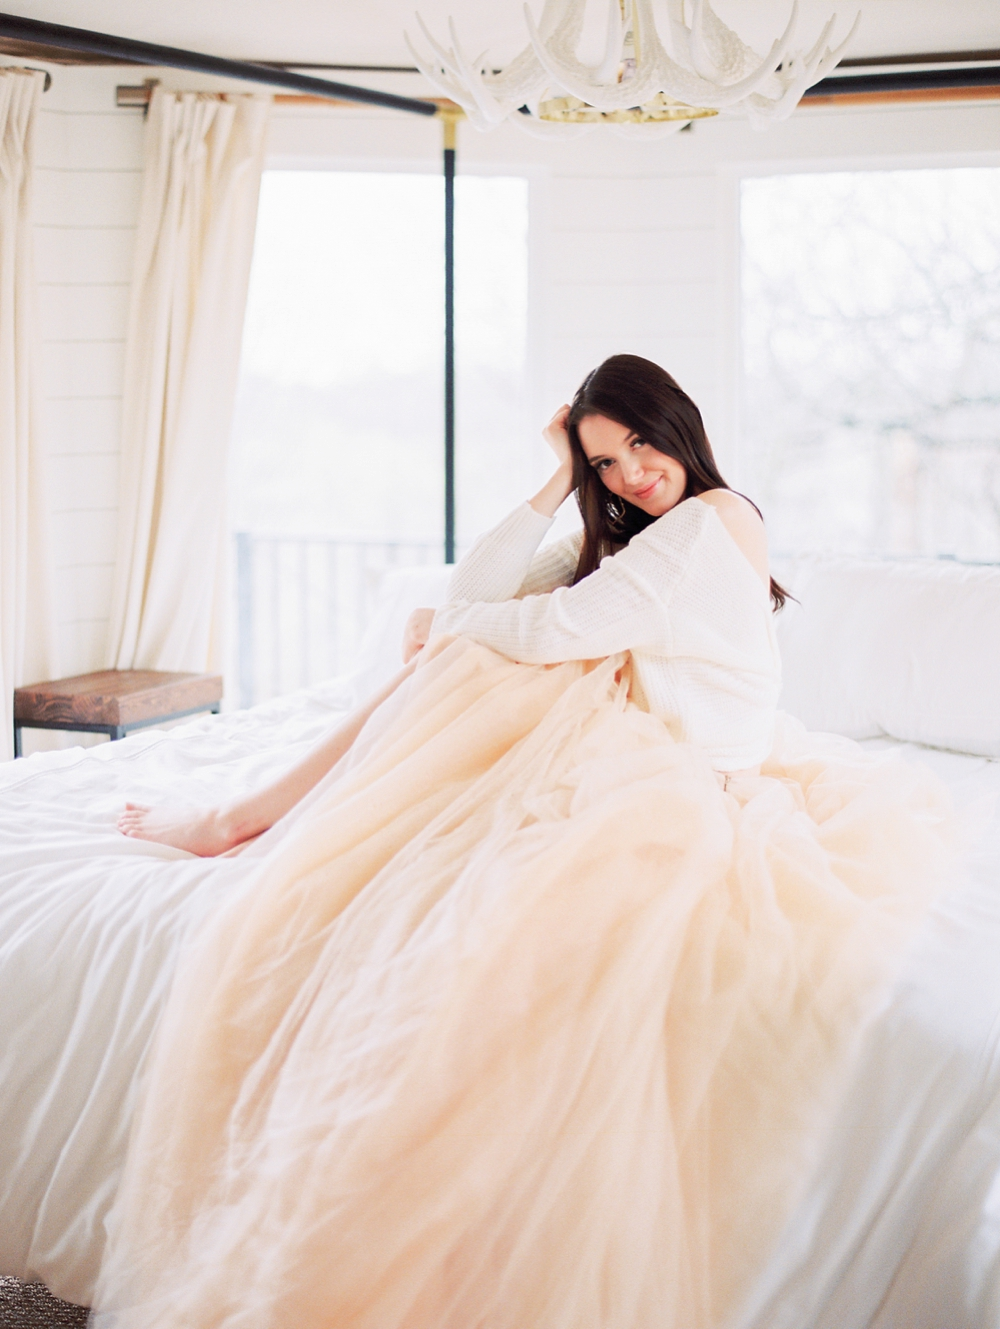 Kristin-La-Voie-Photography-fine-art-wedding-bridal-boudoir-texas-photographer-Dallas-Austin-San-Marcos-wahwahtaysee-resort-61